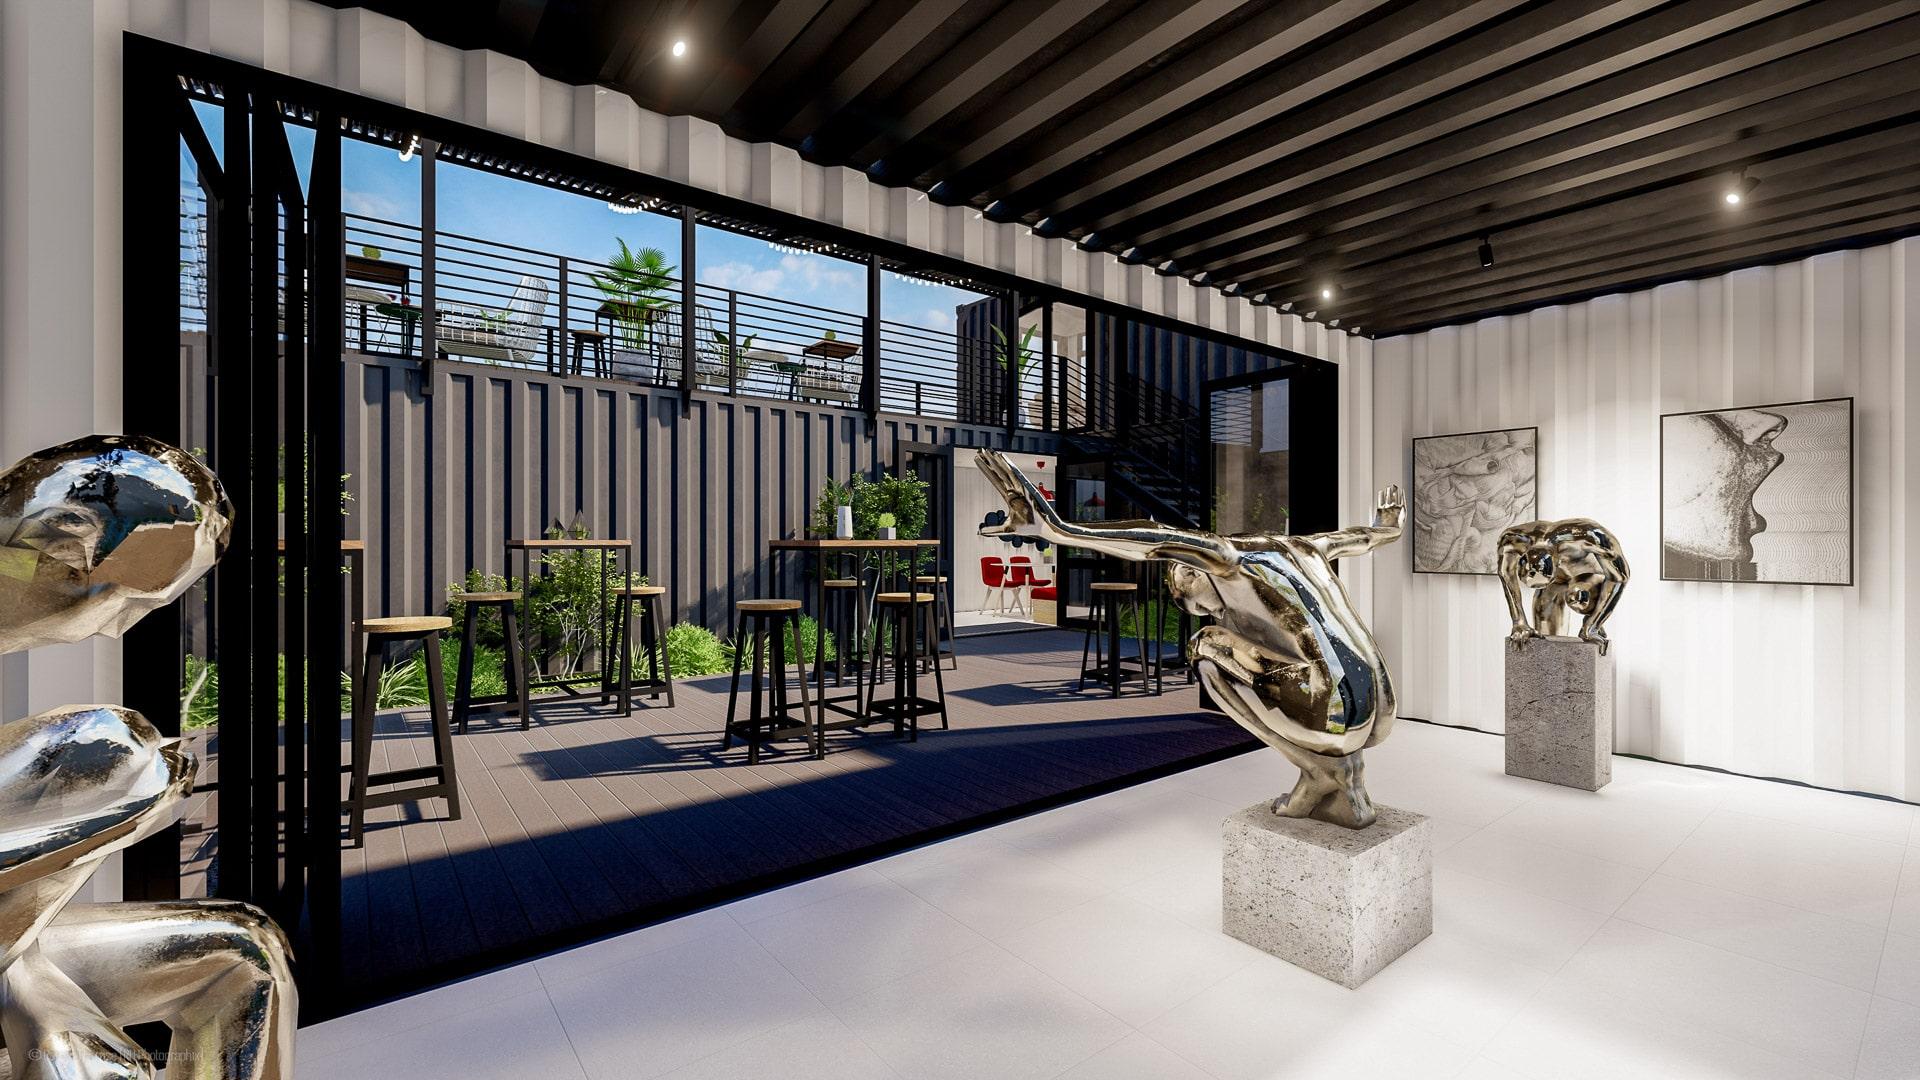 RHPX_Portfolio_LVR Container Restaurant-15